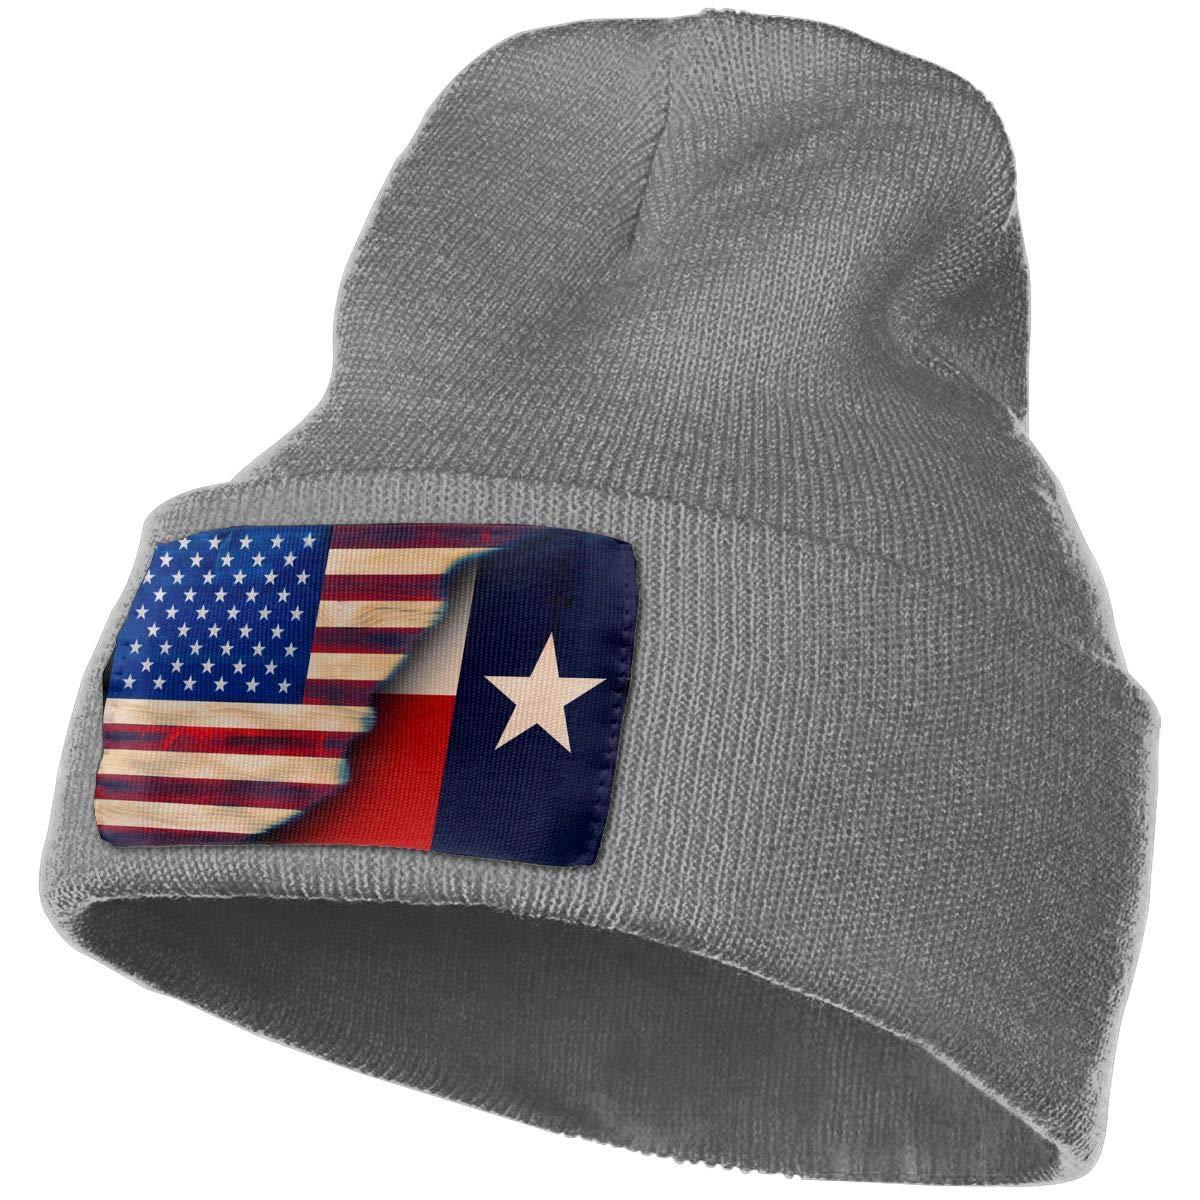 FORDSAN CP Texas with American Flag Mens Beanie Cap Skull Cap Winter Warm Knitting Hats.